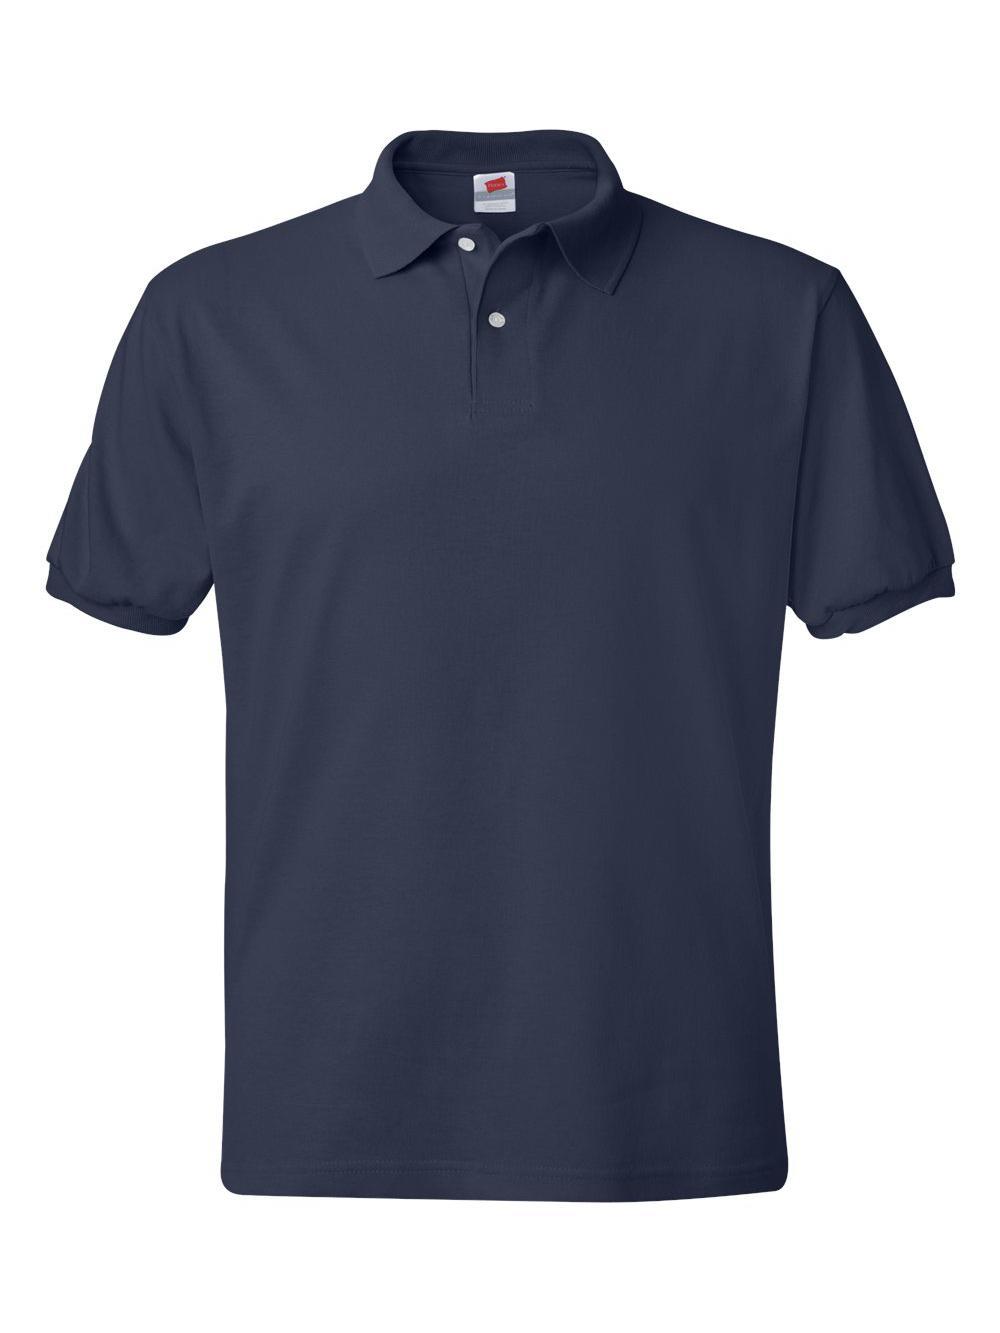 Hanes-Ecosmart-Jersey-Sport-Shirt-054X thumbnail 33